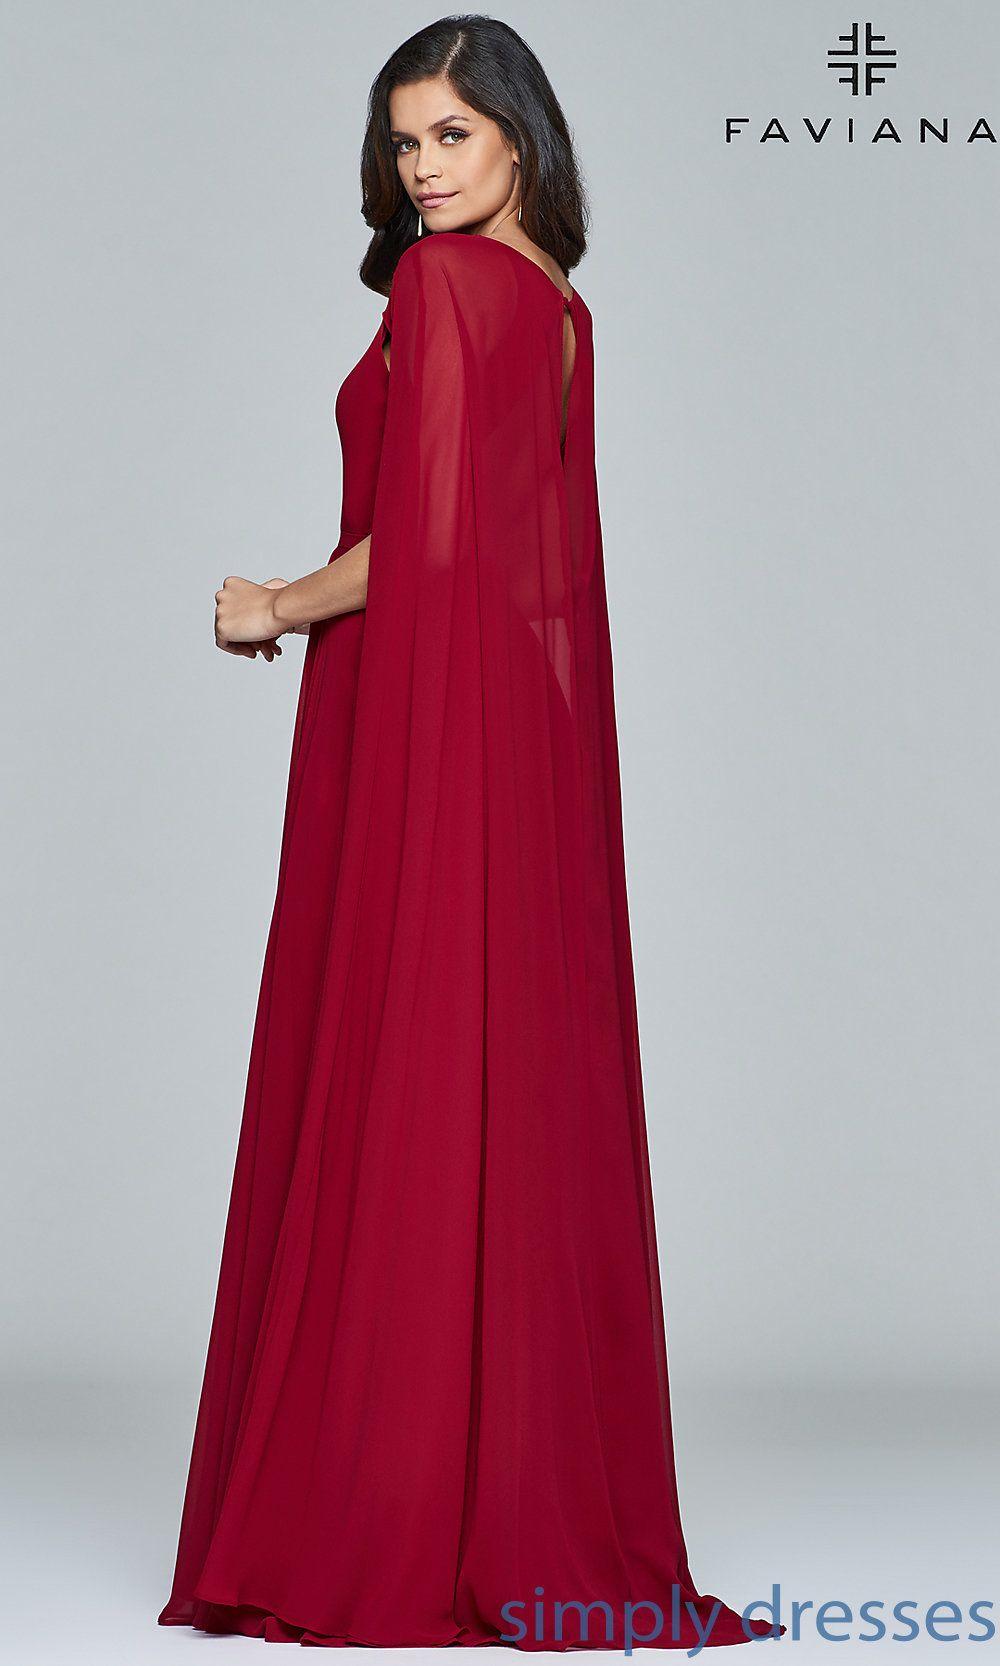 Dresses, Formal, Prom Dresses, Evening Wear: FA-S8087